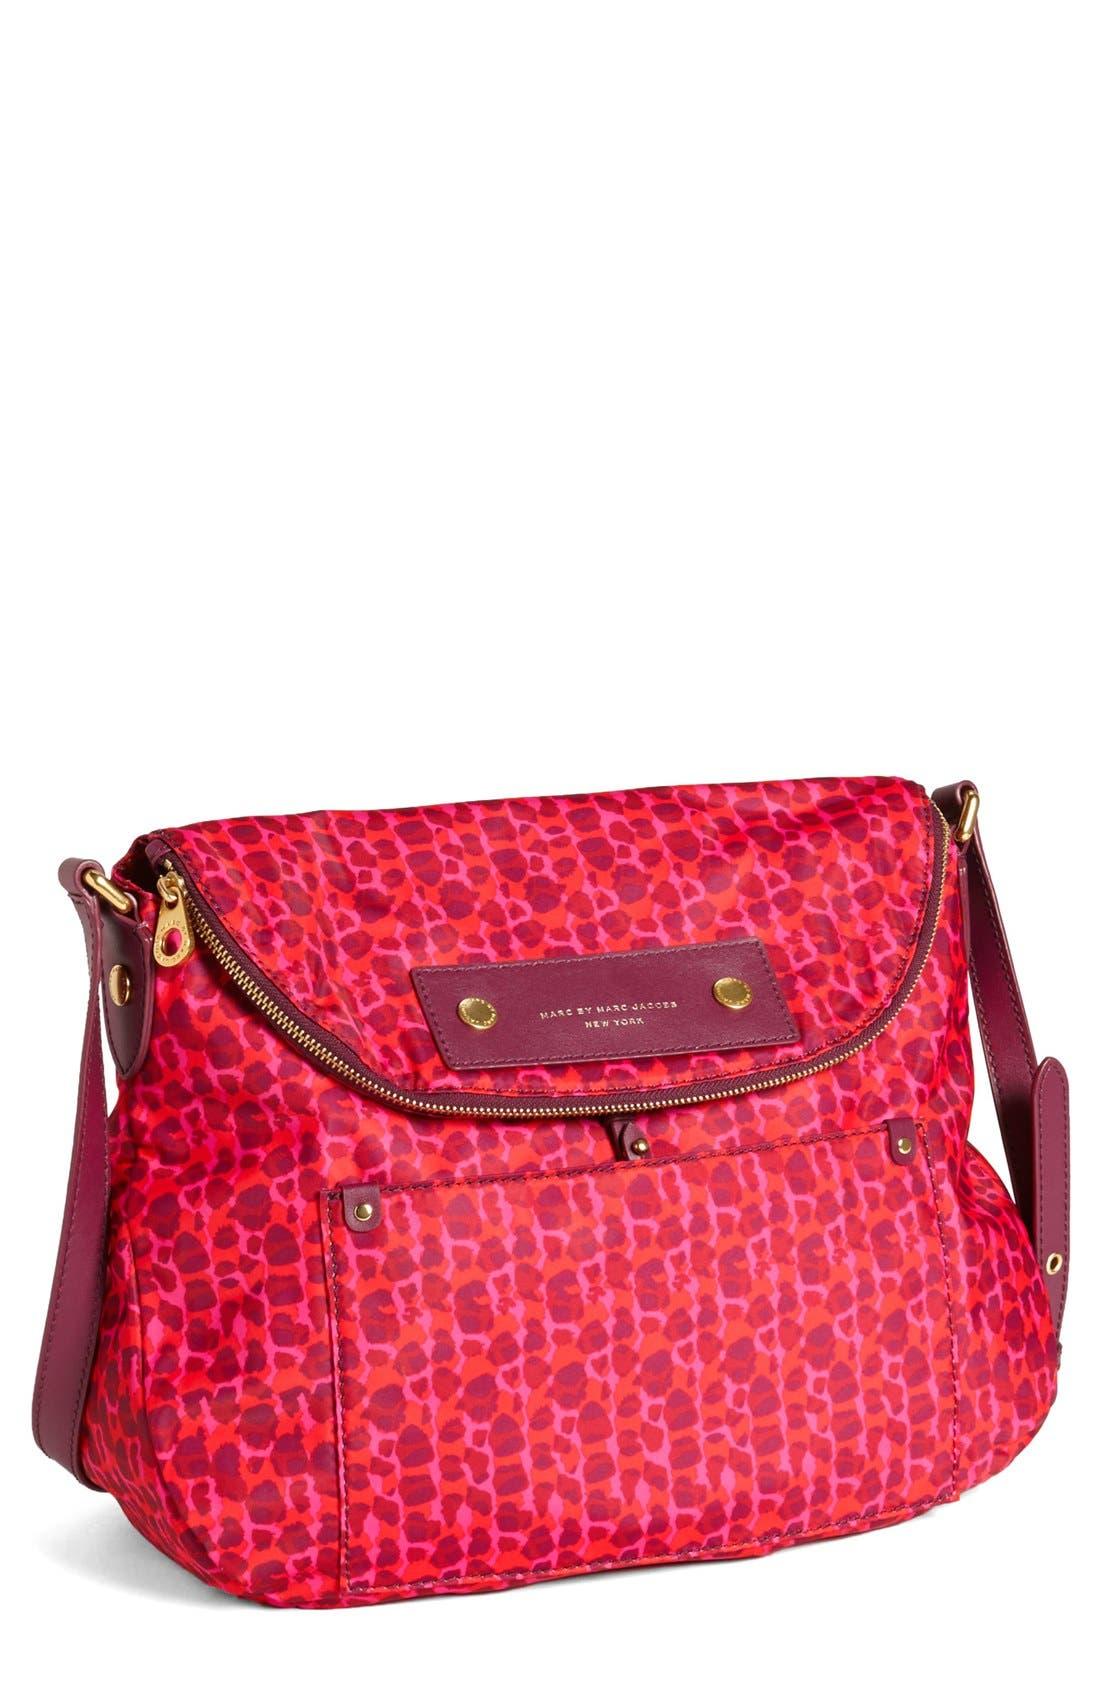 Alternate Image 1 Selected - MARC BY MARC JACOBS 'Preppy Nylon - Printed Sasha' Crossbody Bag